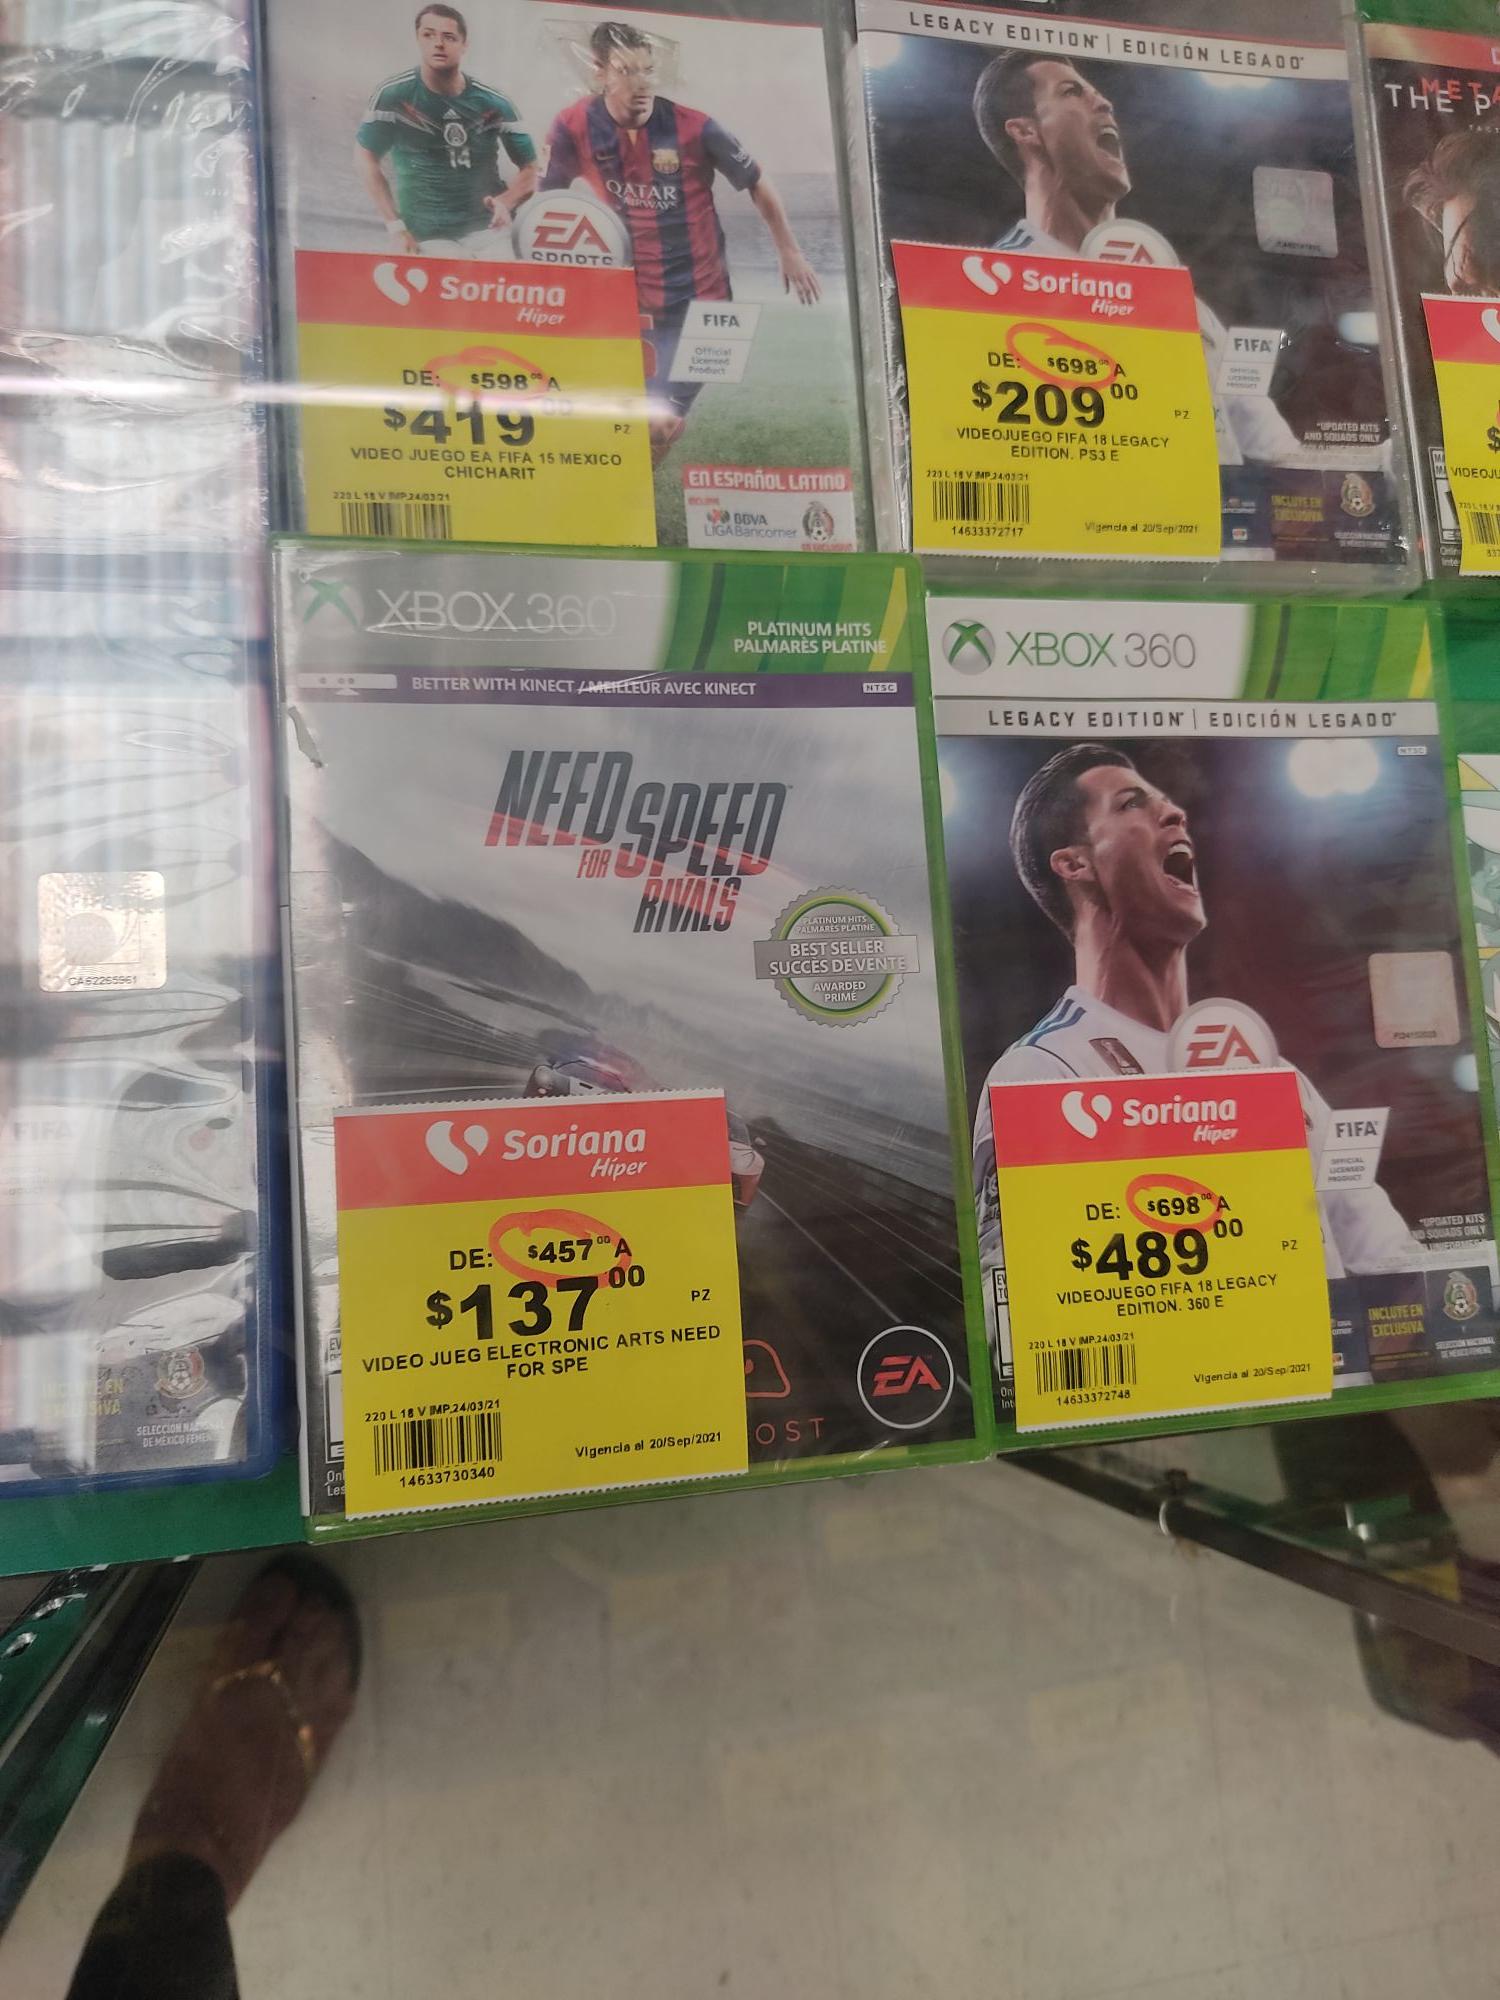 Juego para Xbox 360. NEED FOR SPEED RIVALS En liquidación Soriana sucursal Diana Acapulco